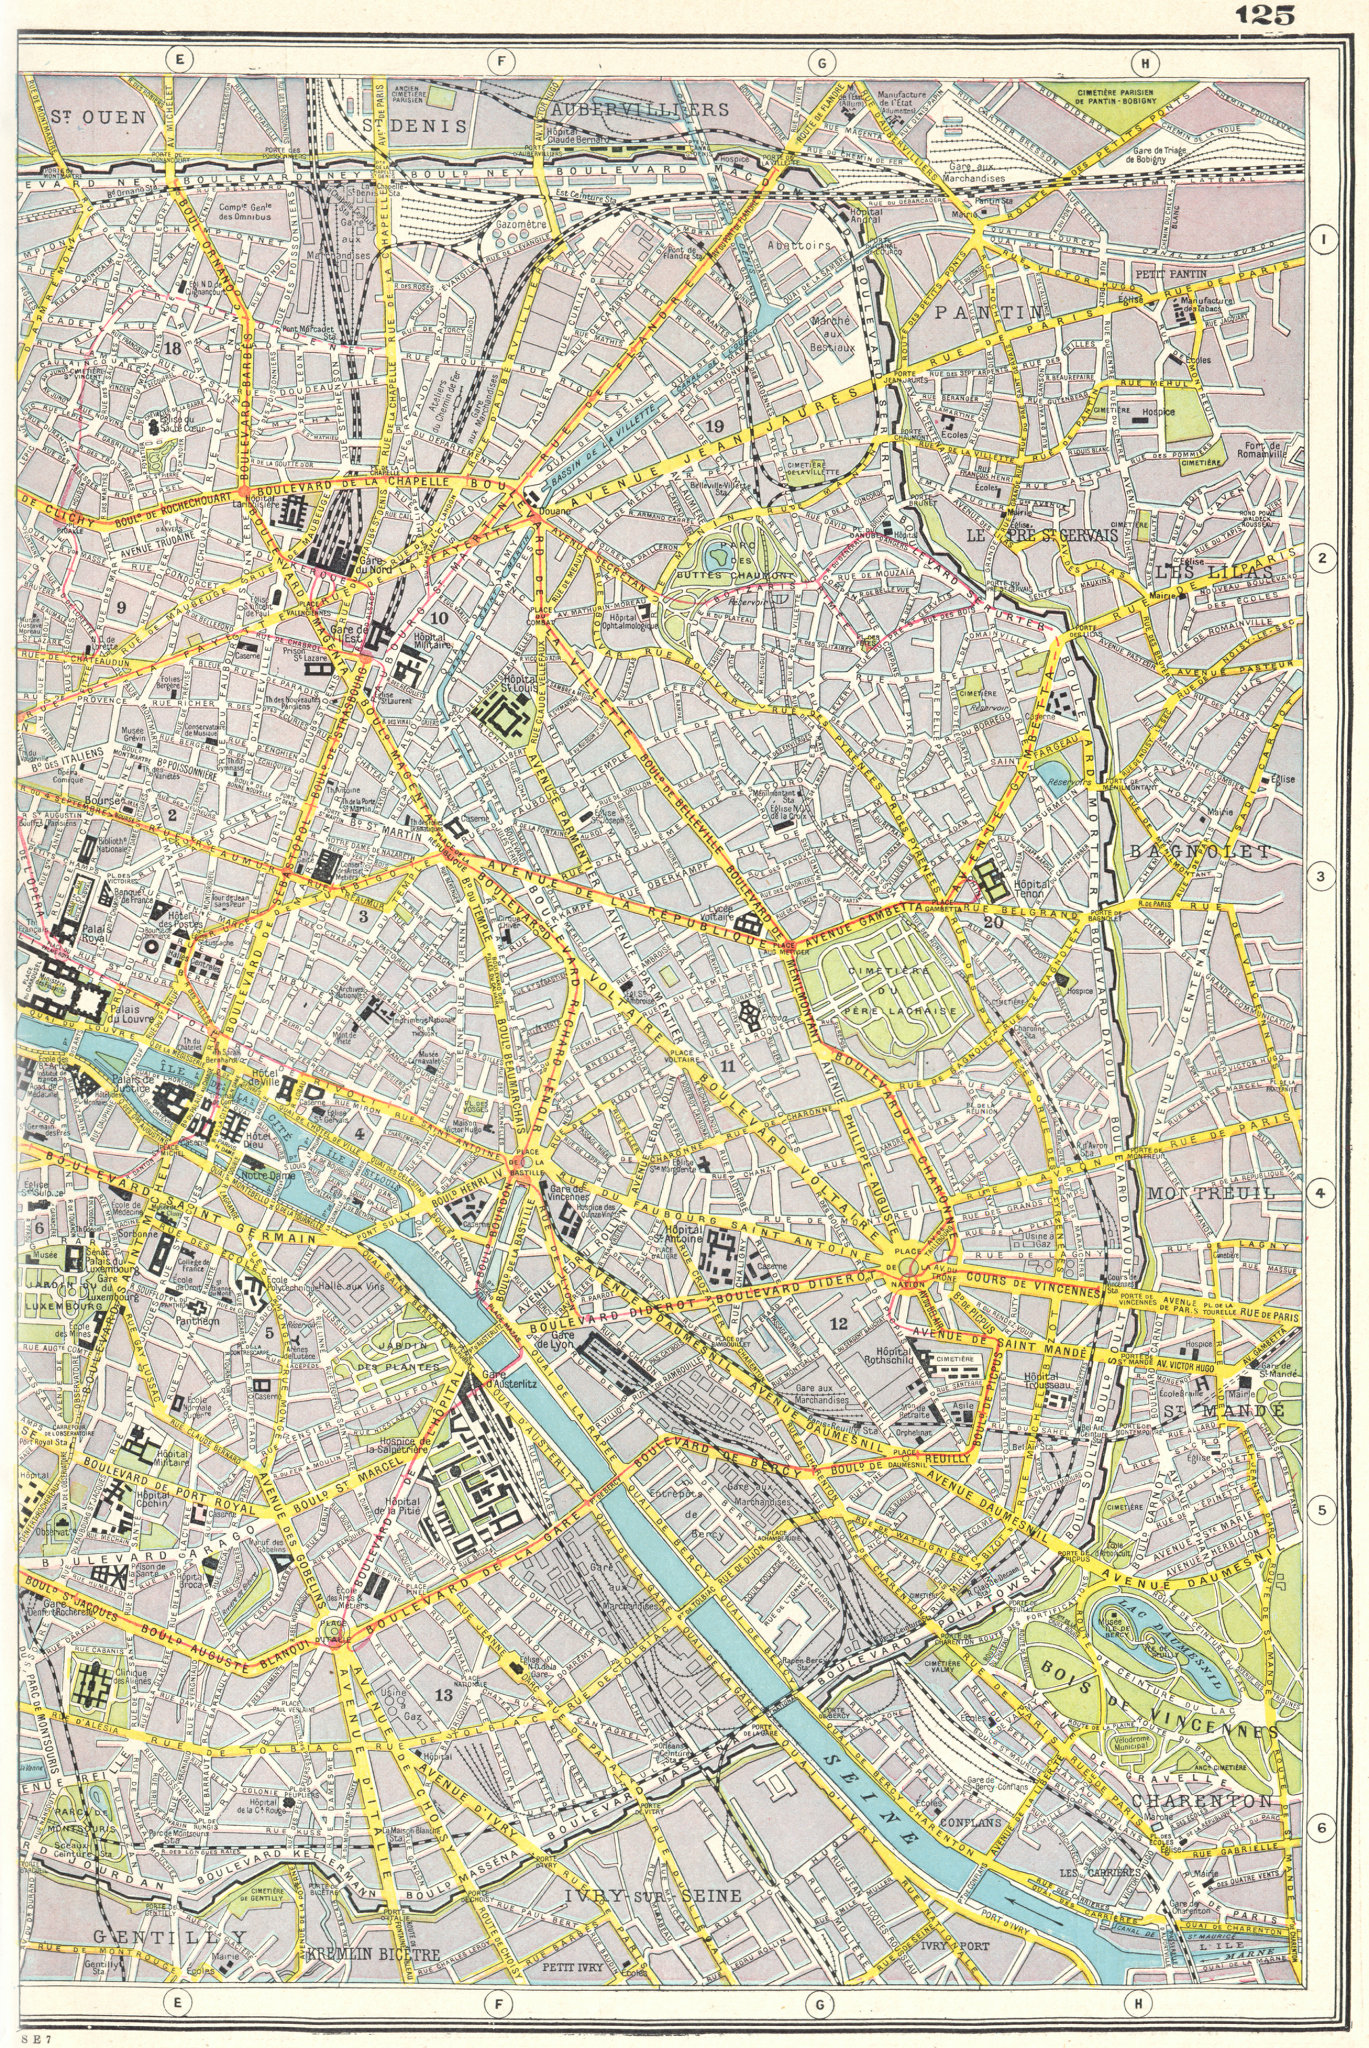 Associate Product PARIS EAST. Plan of Paris east sheet. HARMSWORTH 1920 old antique map chart